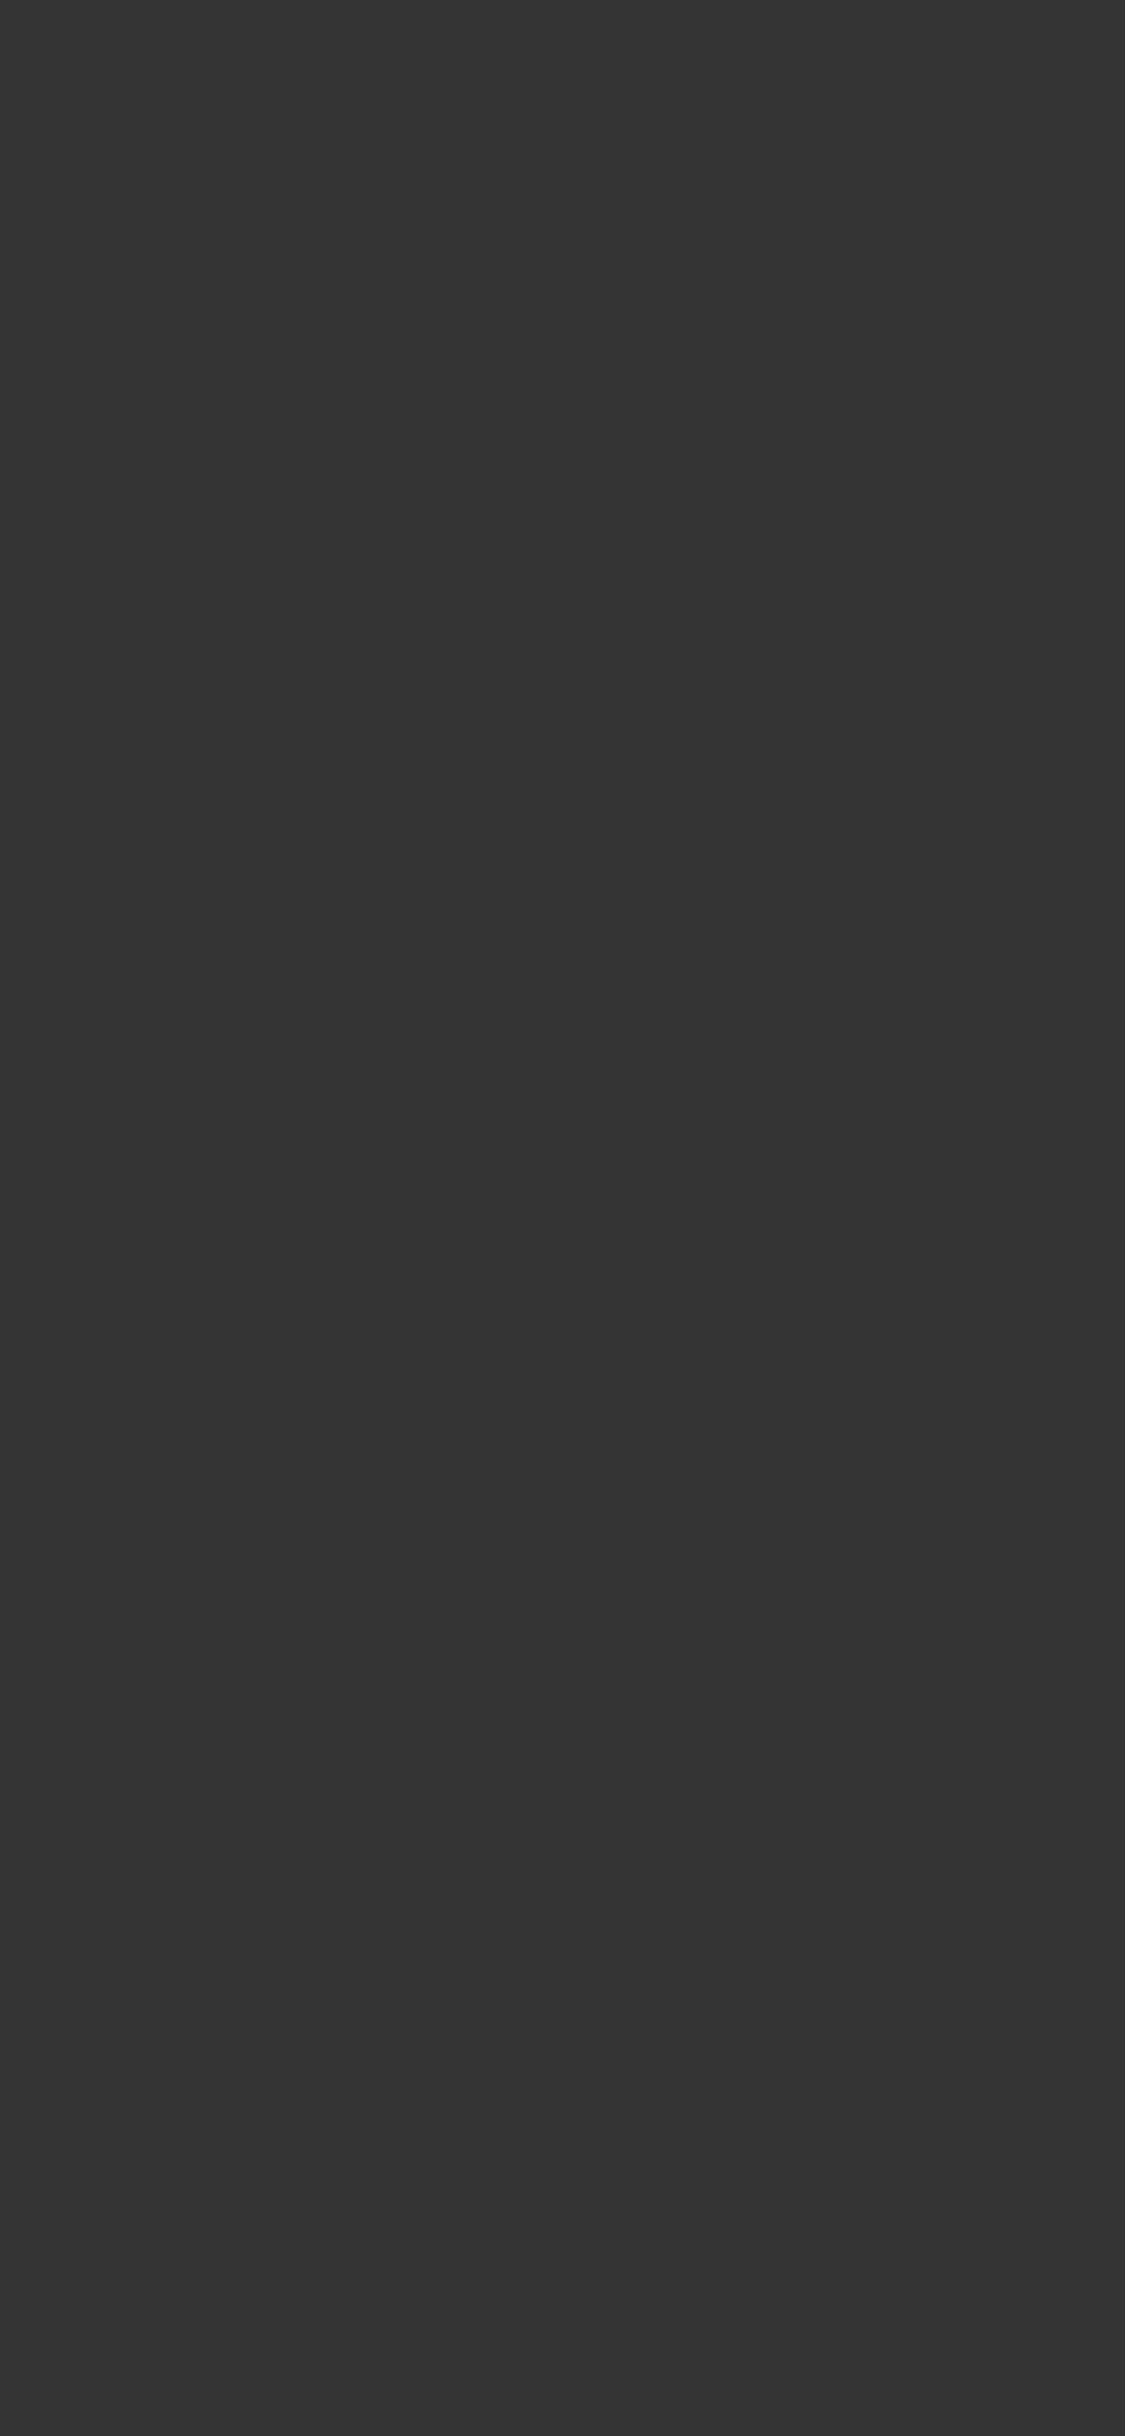 1125x2436 Jet Solid Color Background